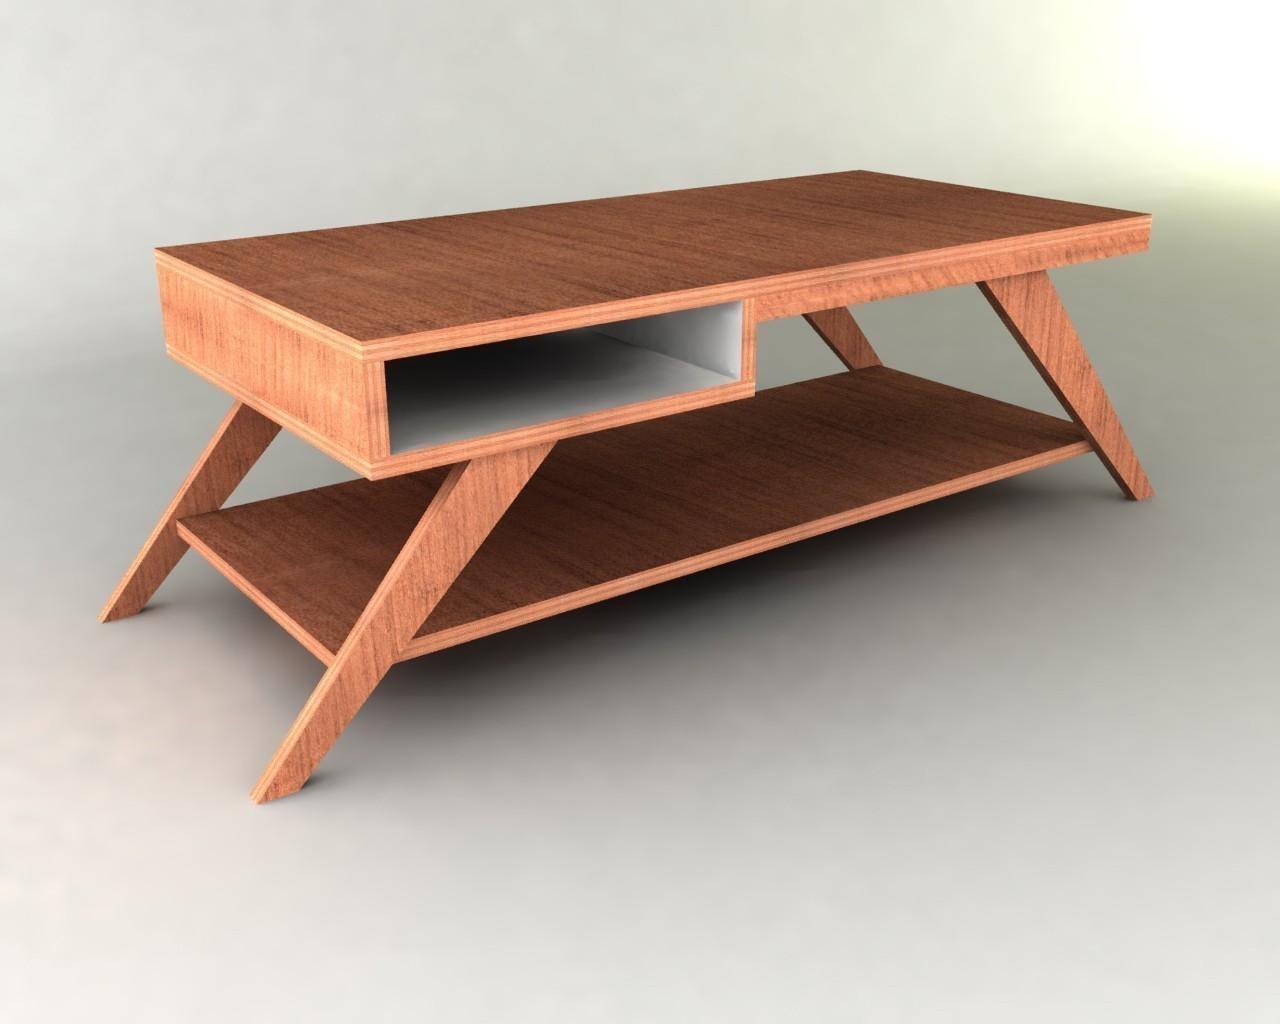 modern coffee table design plans photo - 1